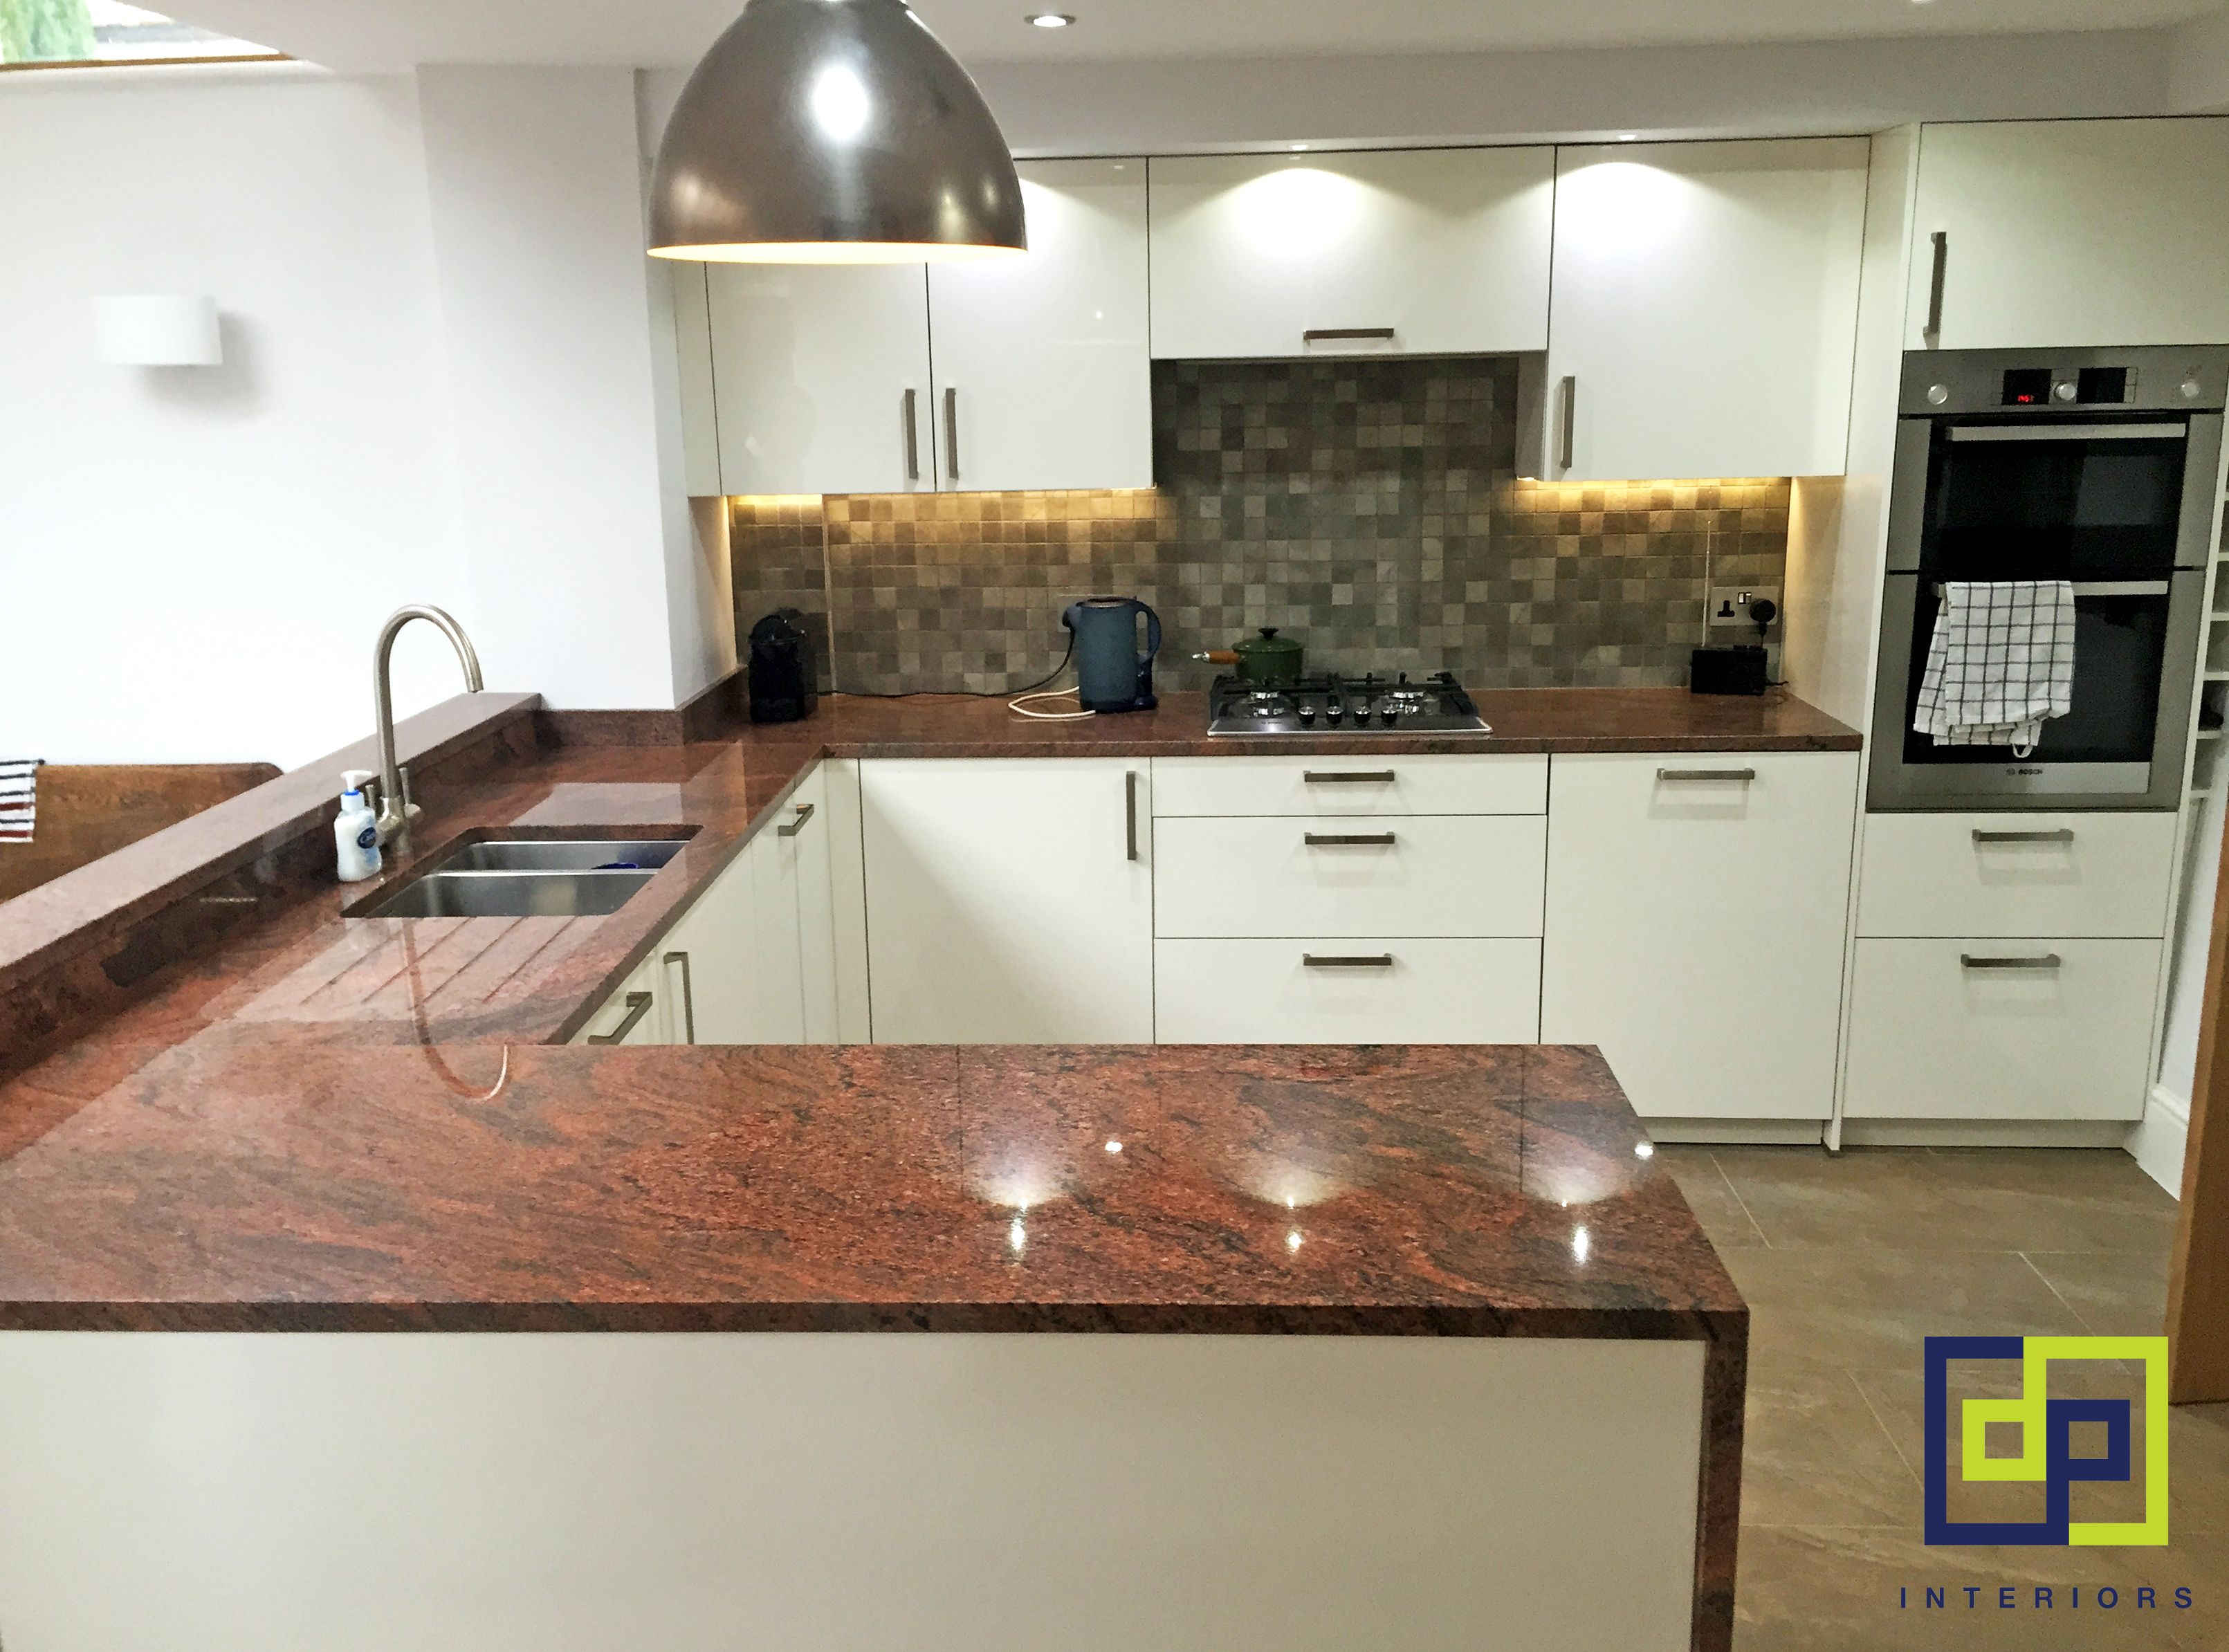 red granite gloss kitchen cocina pinterest gloss kitchen granite and kitchens. Black Bedroom Furniture Sets. Home Design Ideas